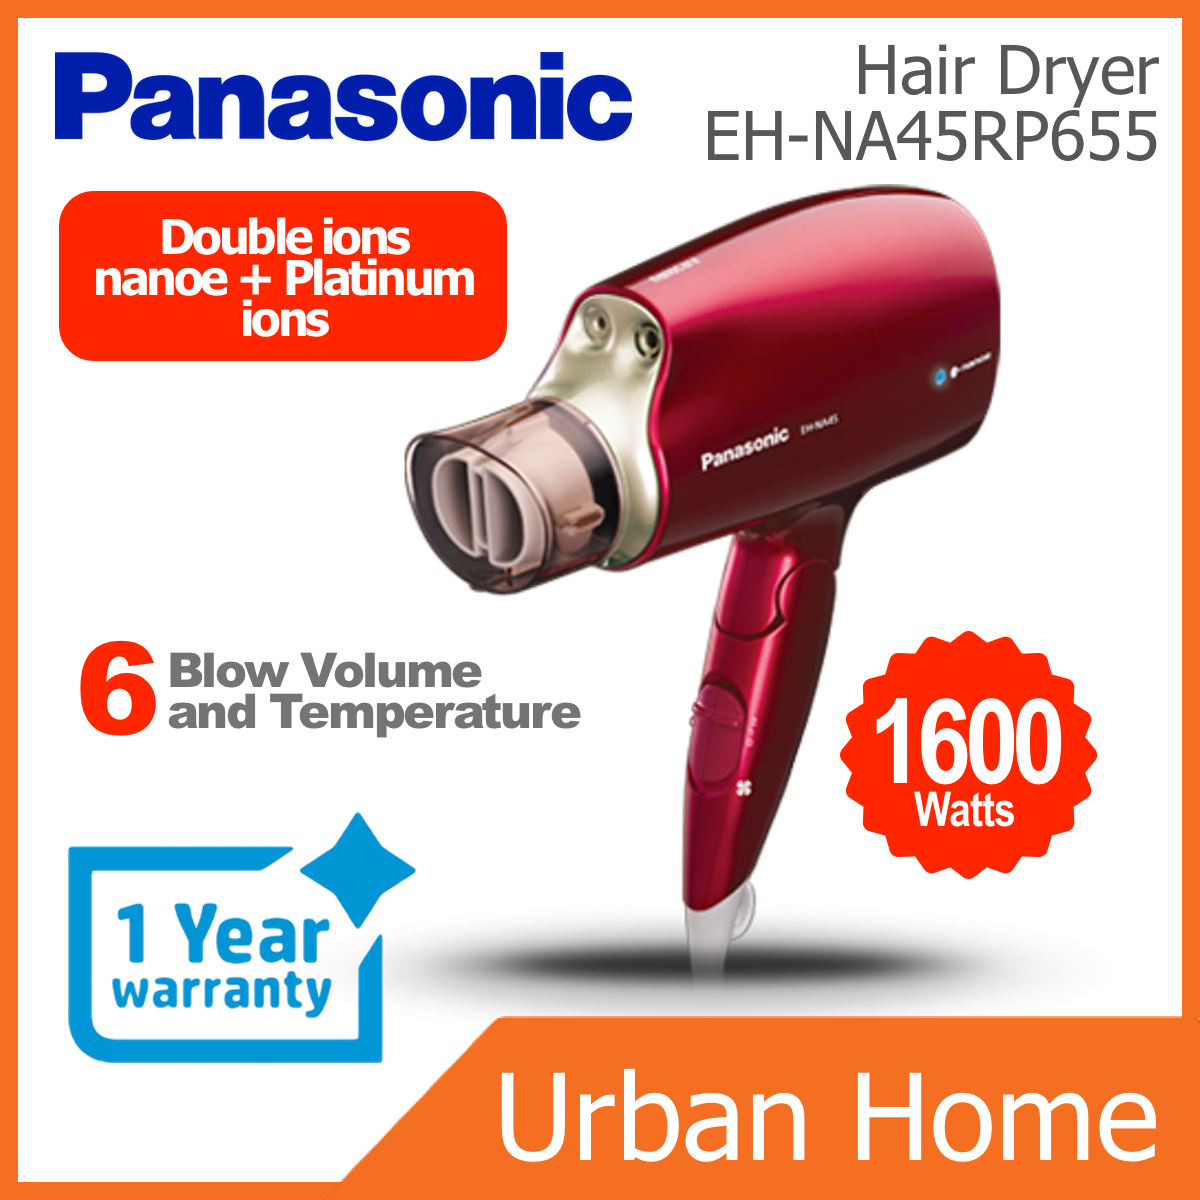 PANASONIC 1600w nanoe & Platinum ions Hair Dryer (EH-NA45/EHNA45/EH-NA45RP655/EHNA45RP655)